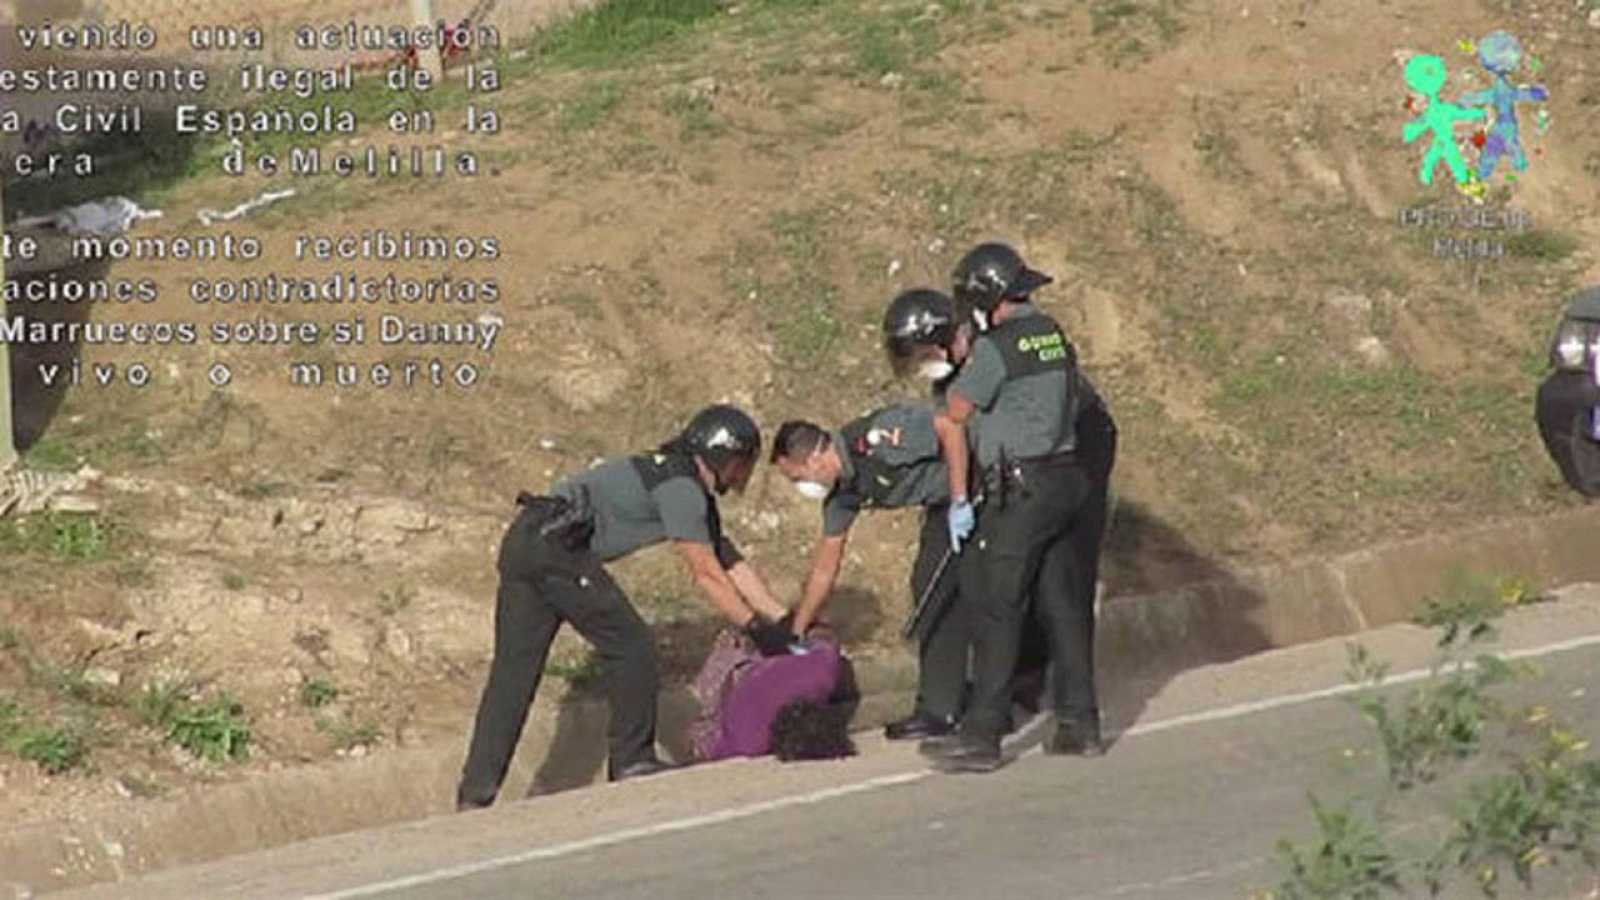 Captura del vídeo difundido por la ONG Prodein sobre el salto a la valla el 15 de octubre de 2014